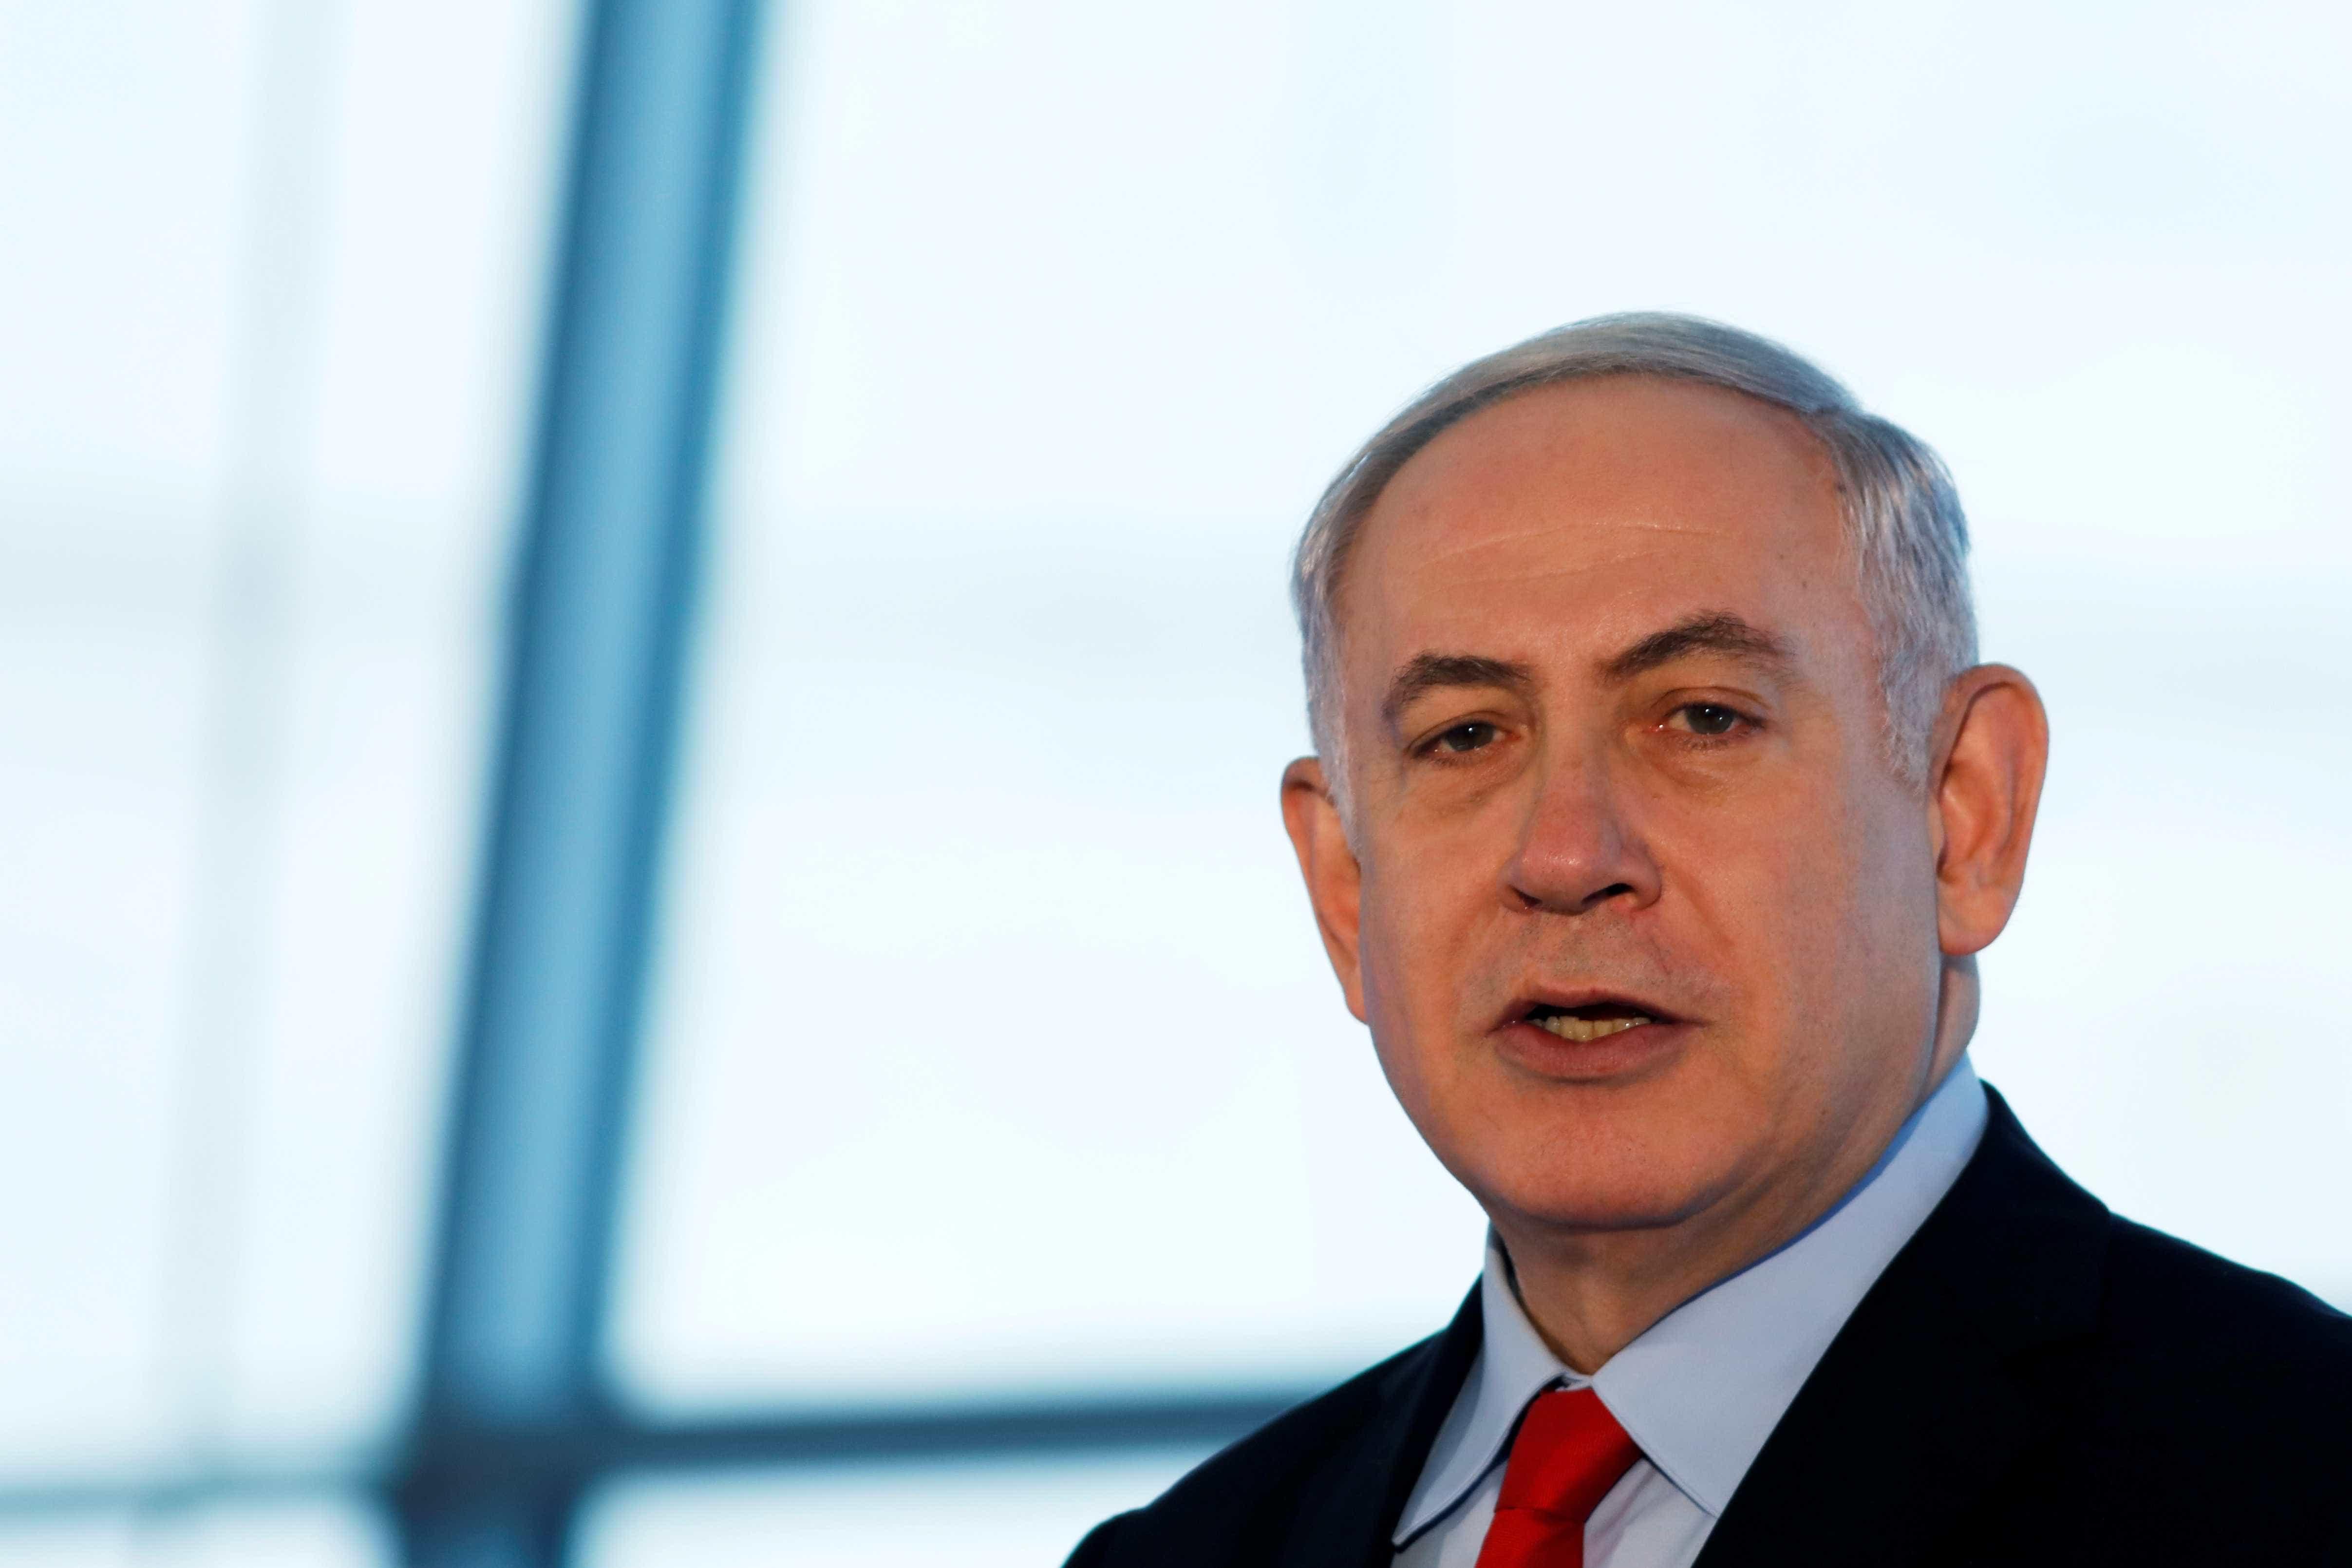 Premier de Israel exibe pedaço de drone para criticar Irã